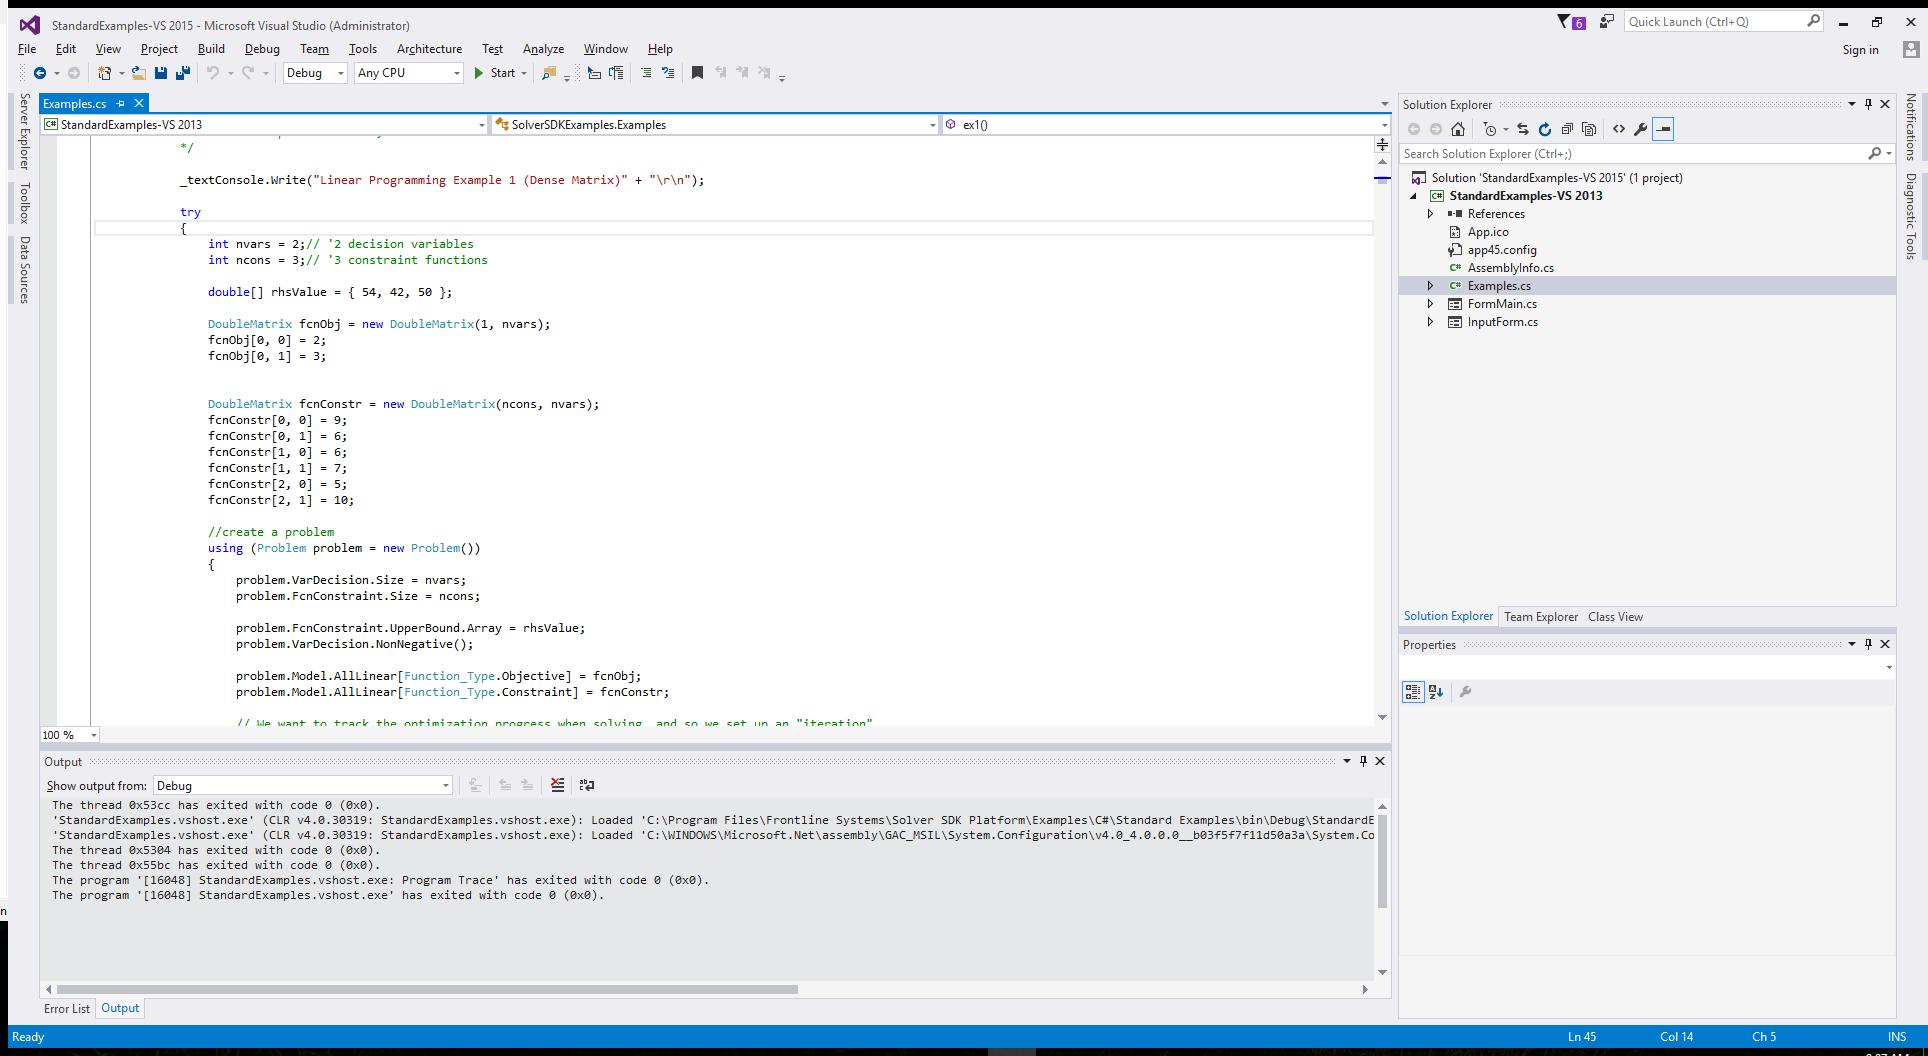 Frontline Systems Releases Solver SDK® Platform V2016 with